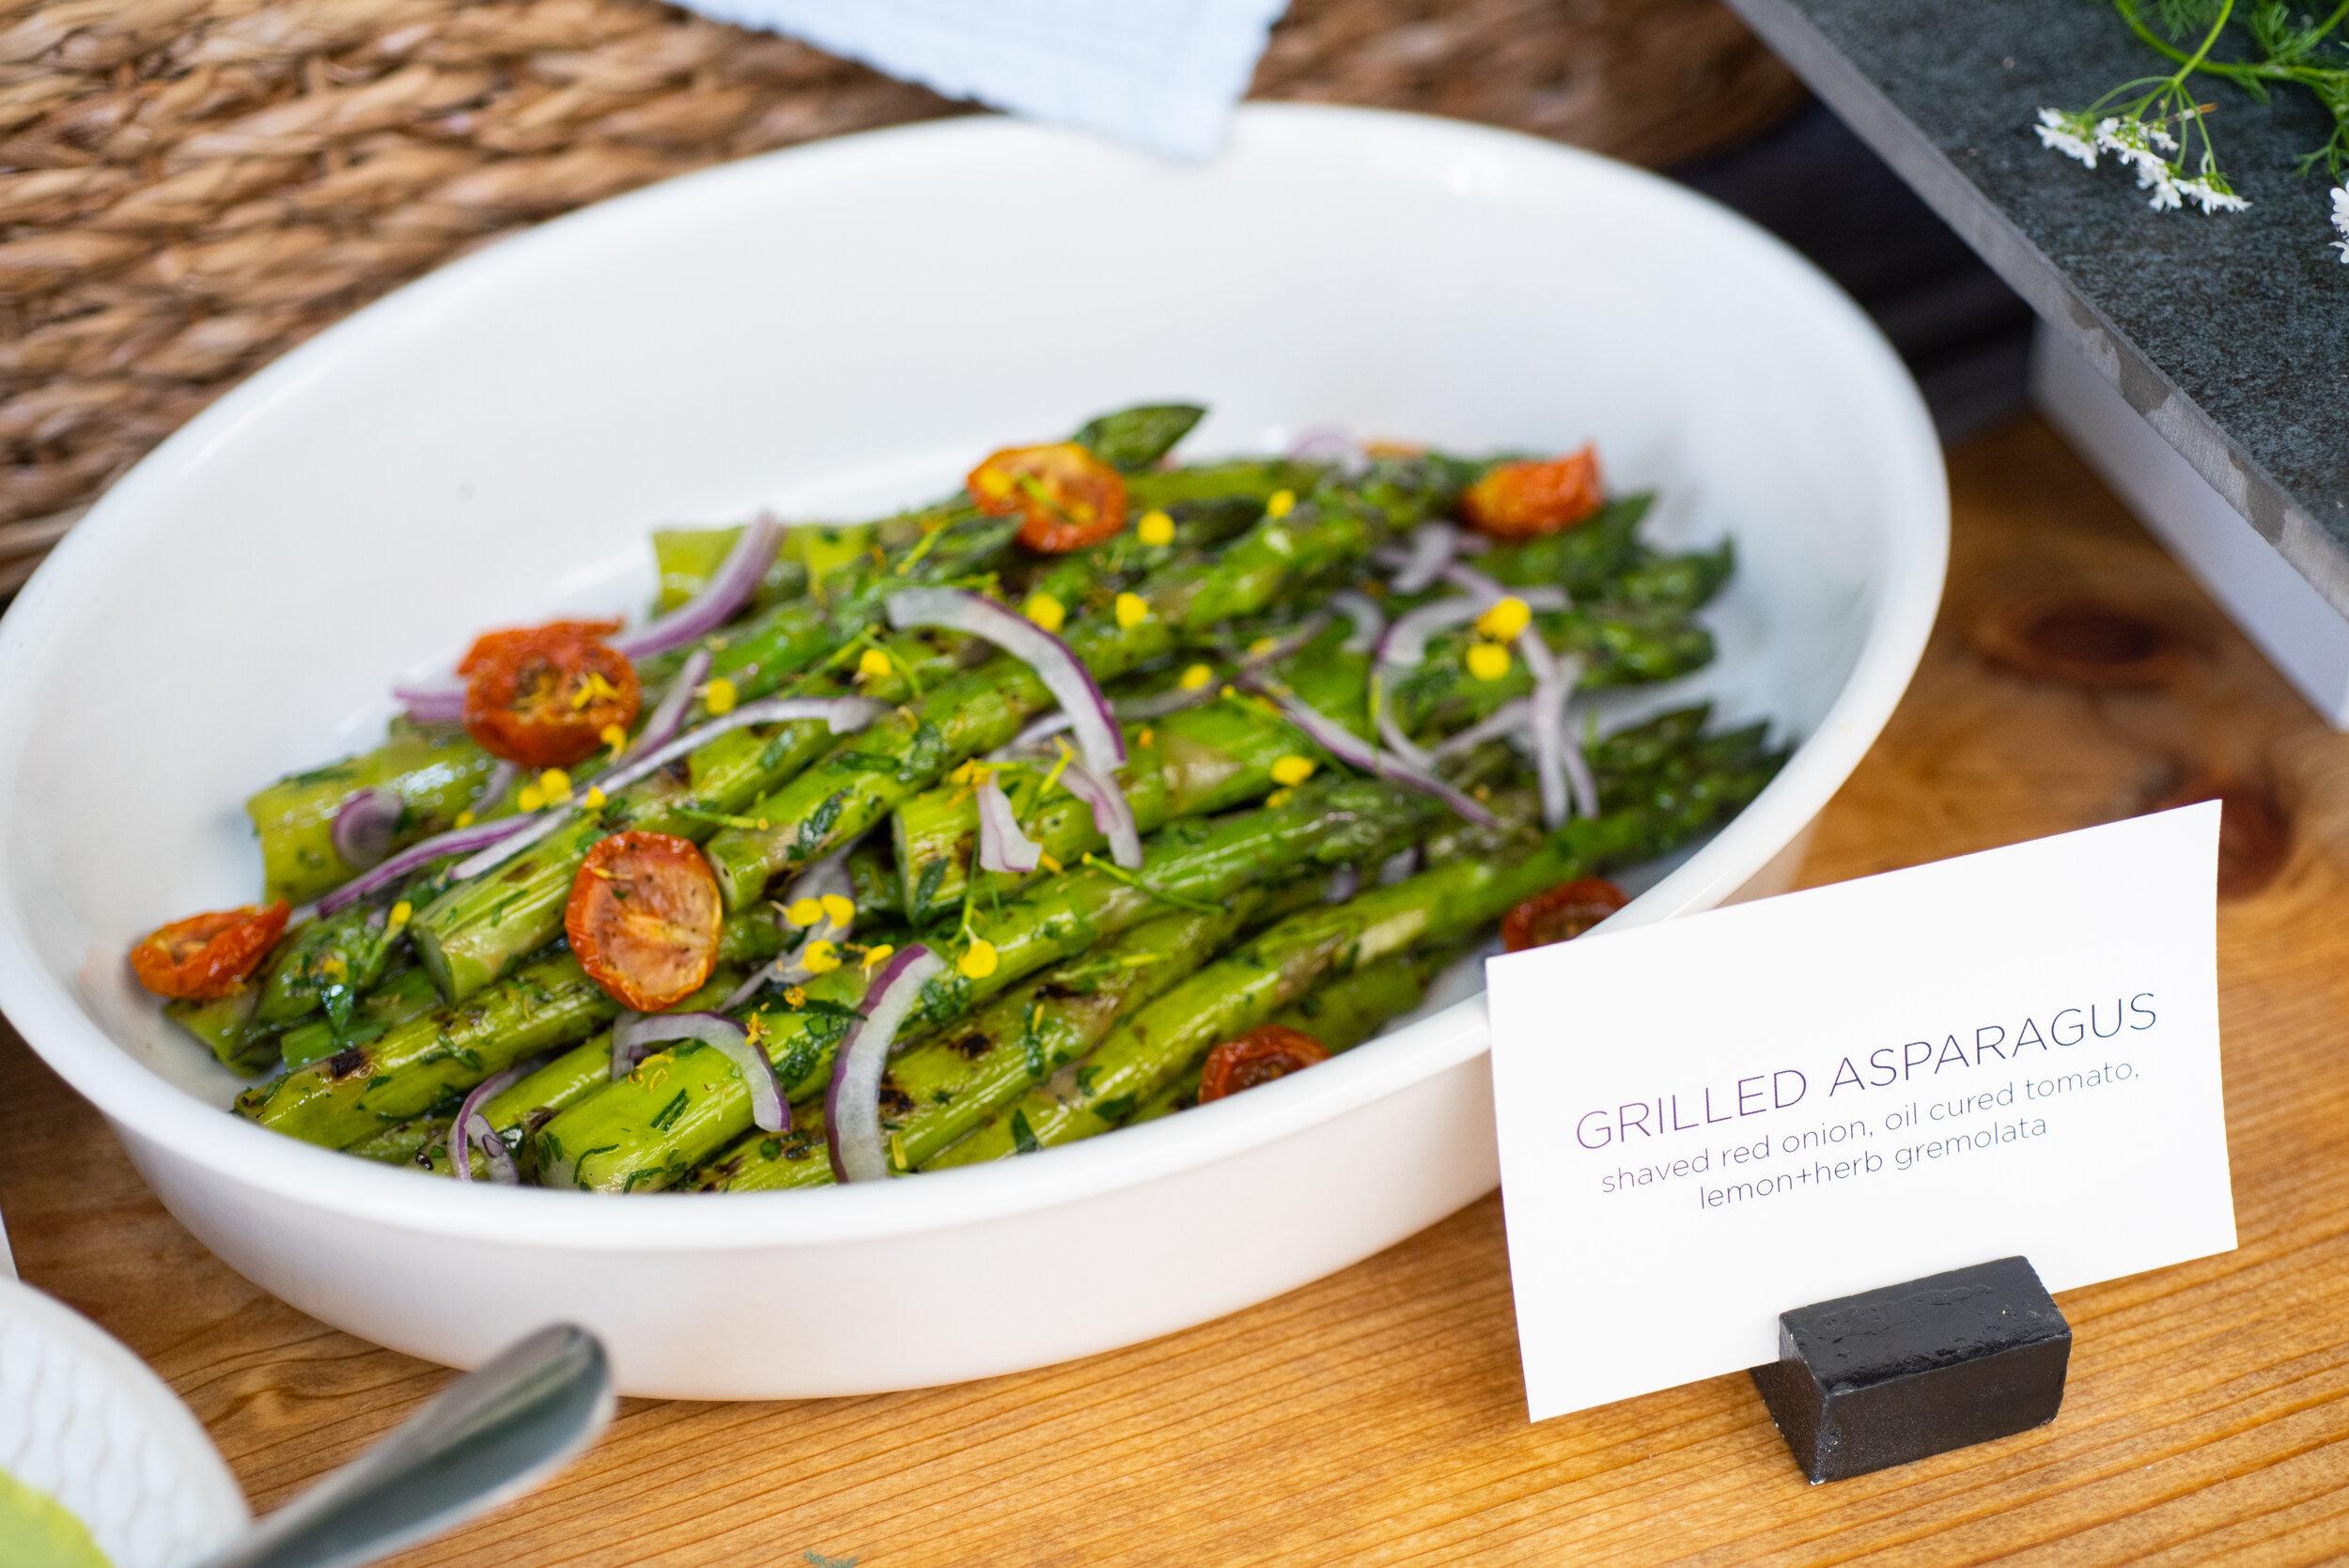 Buffet - Asparagus.jpg